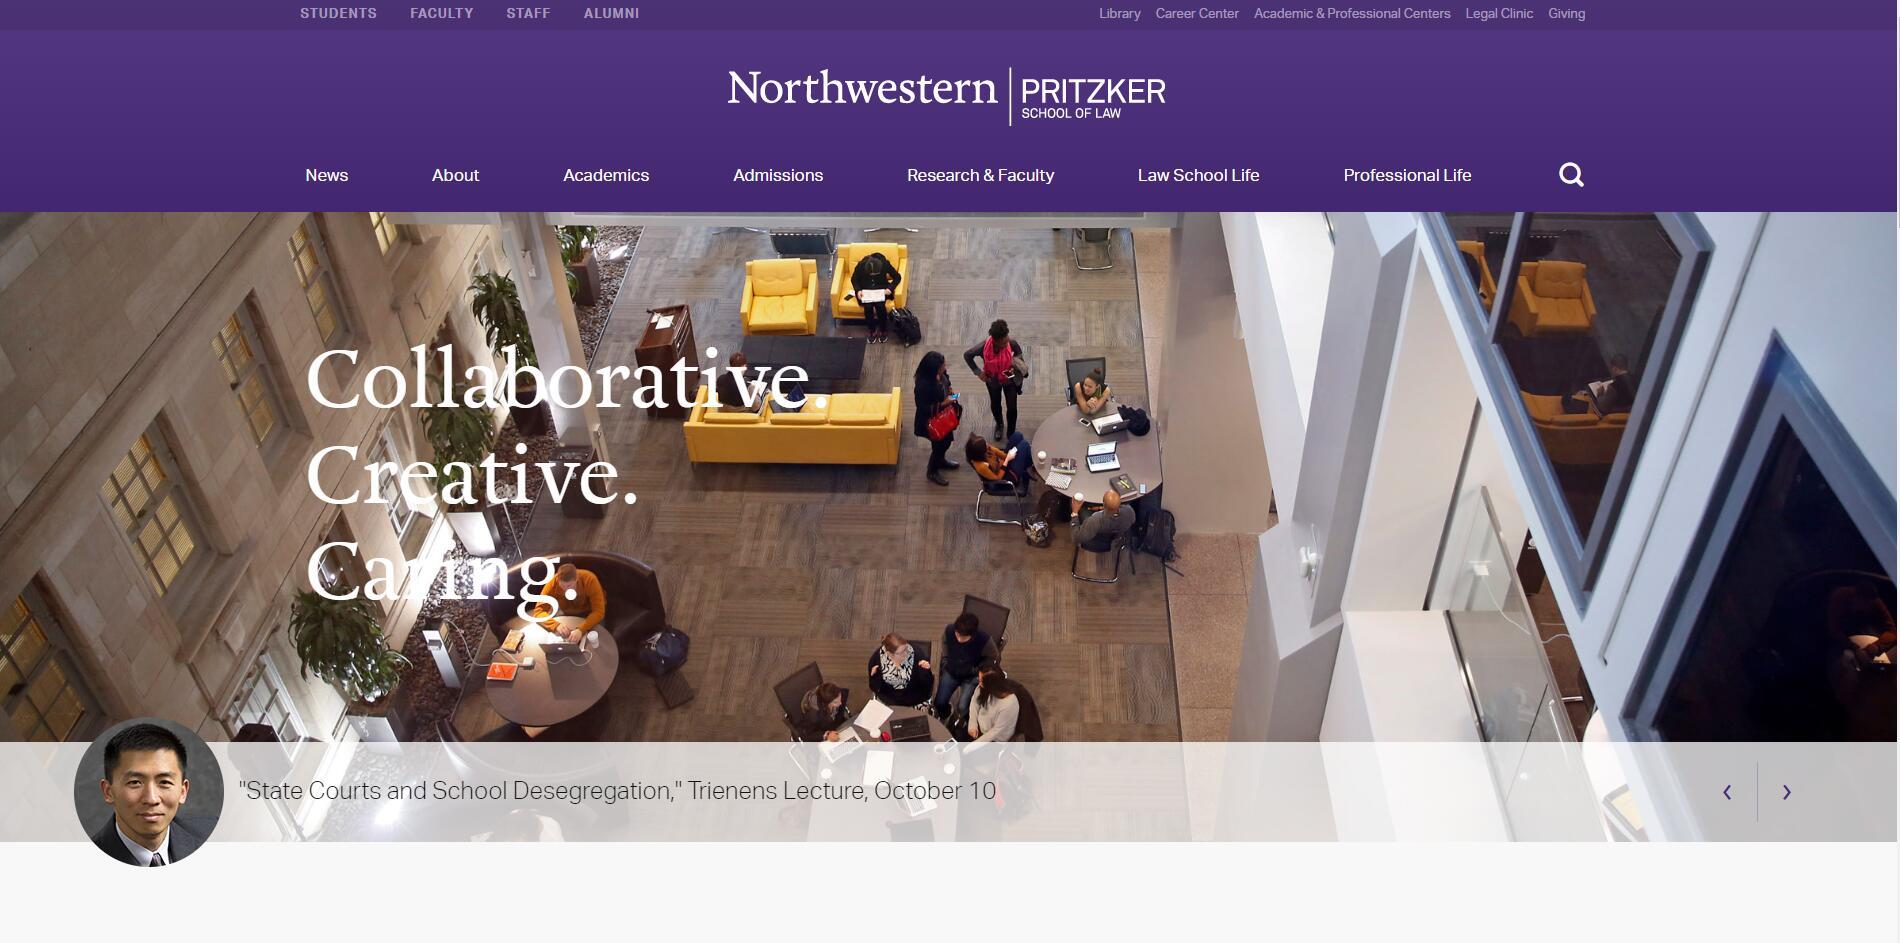 The School of Law at Northwestern University